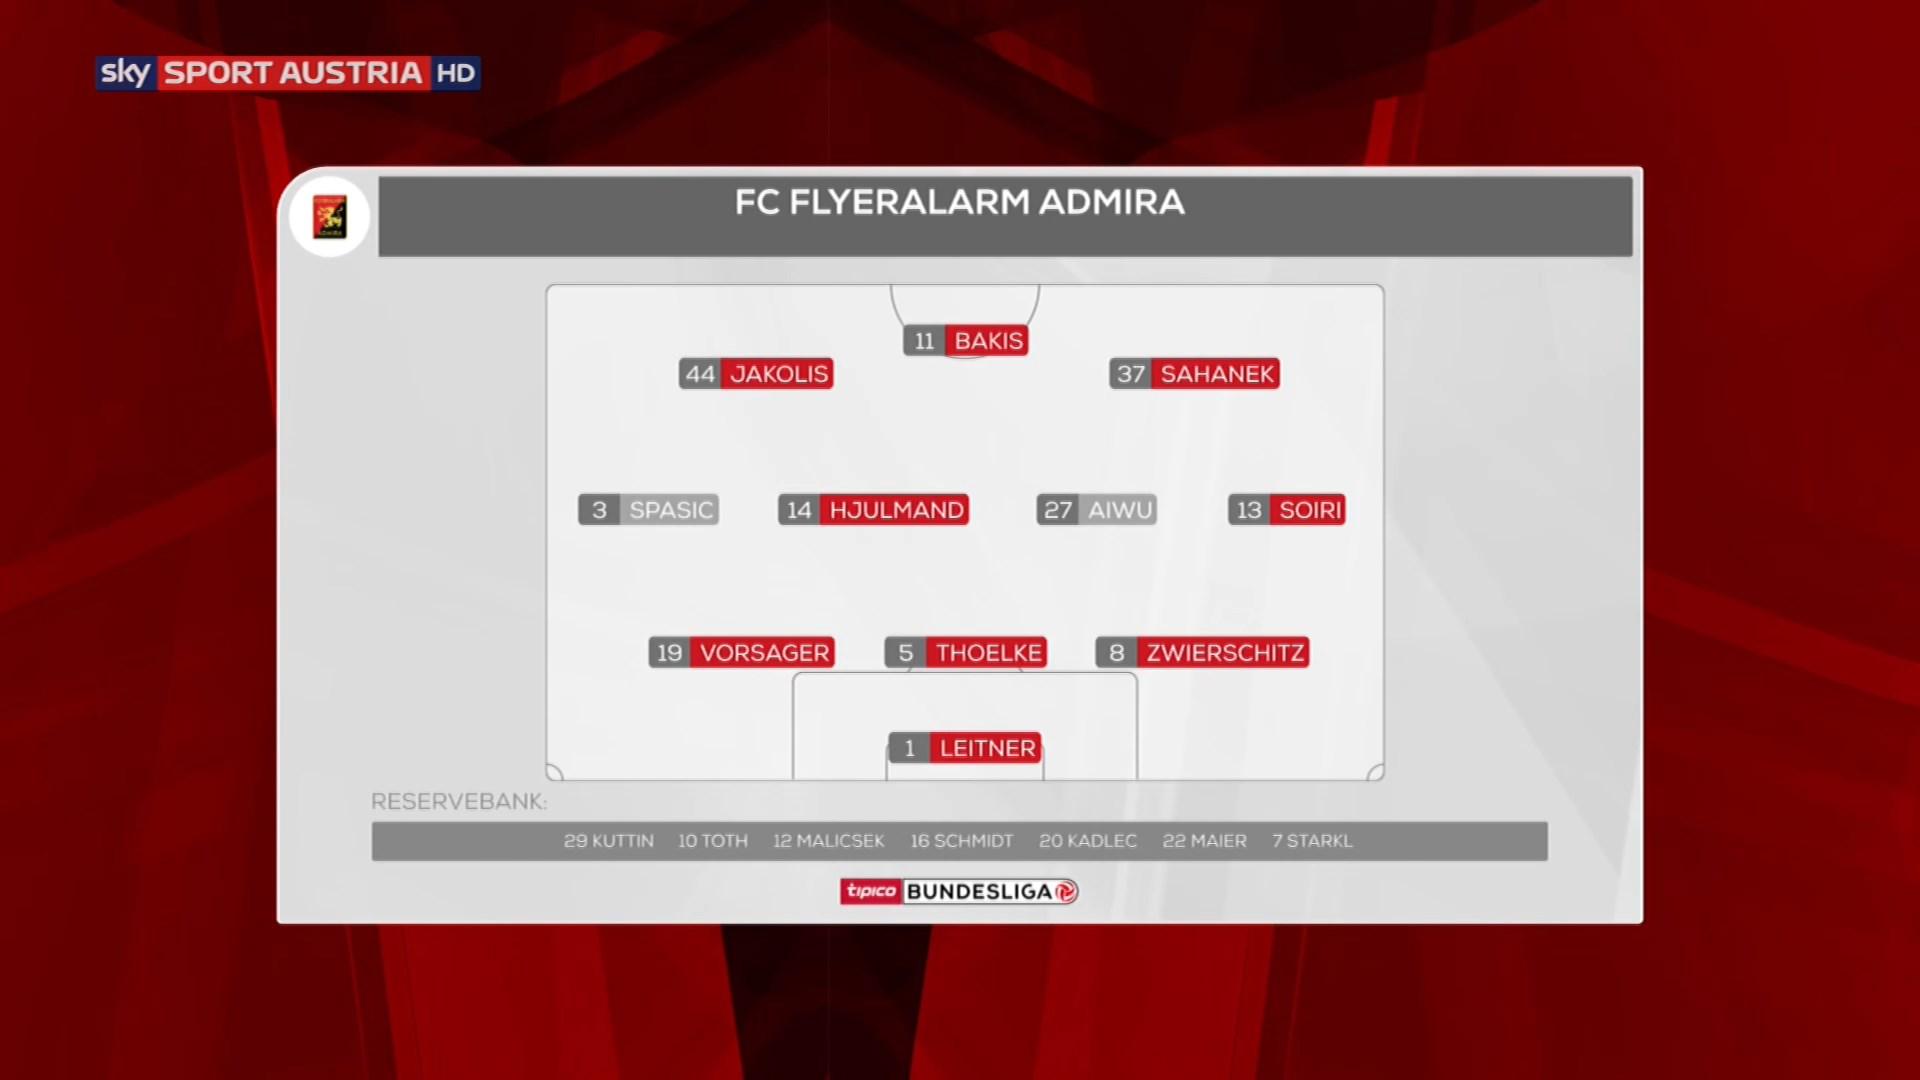 Fútboltipico Bundesliga 1819 Fc Flyeralarm Admira Vs Austria